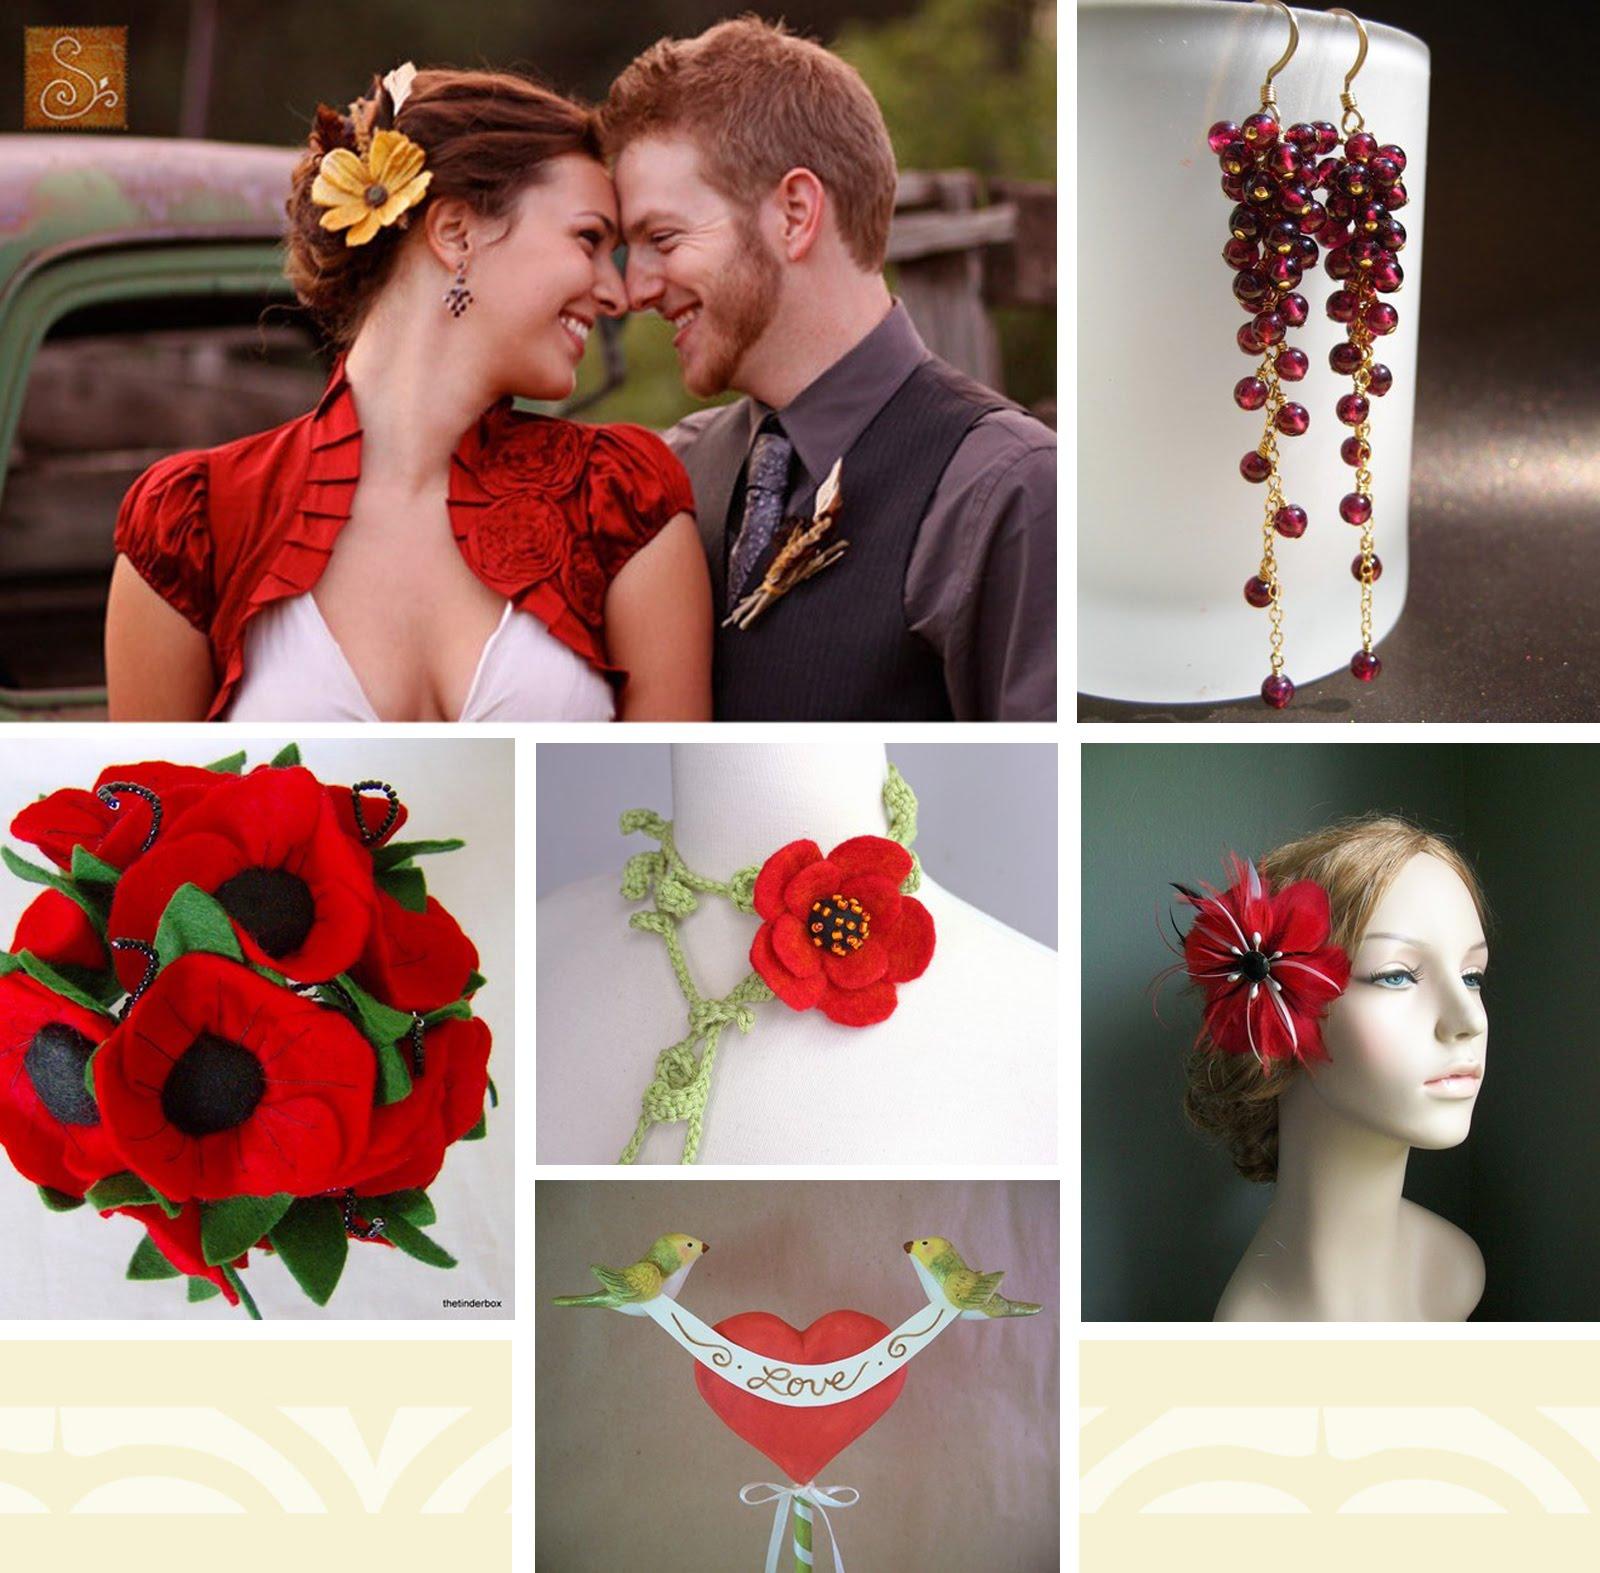 http://3.bp.blogspot.com/_rkF9mRR2AtM/S-HyEWd-inI/AAAAAAAAAYk/cNV0eaOlqU4/s1600/Etsy_Red_Wedding2.jpg